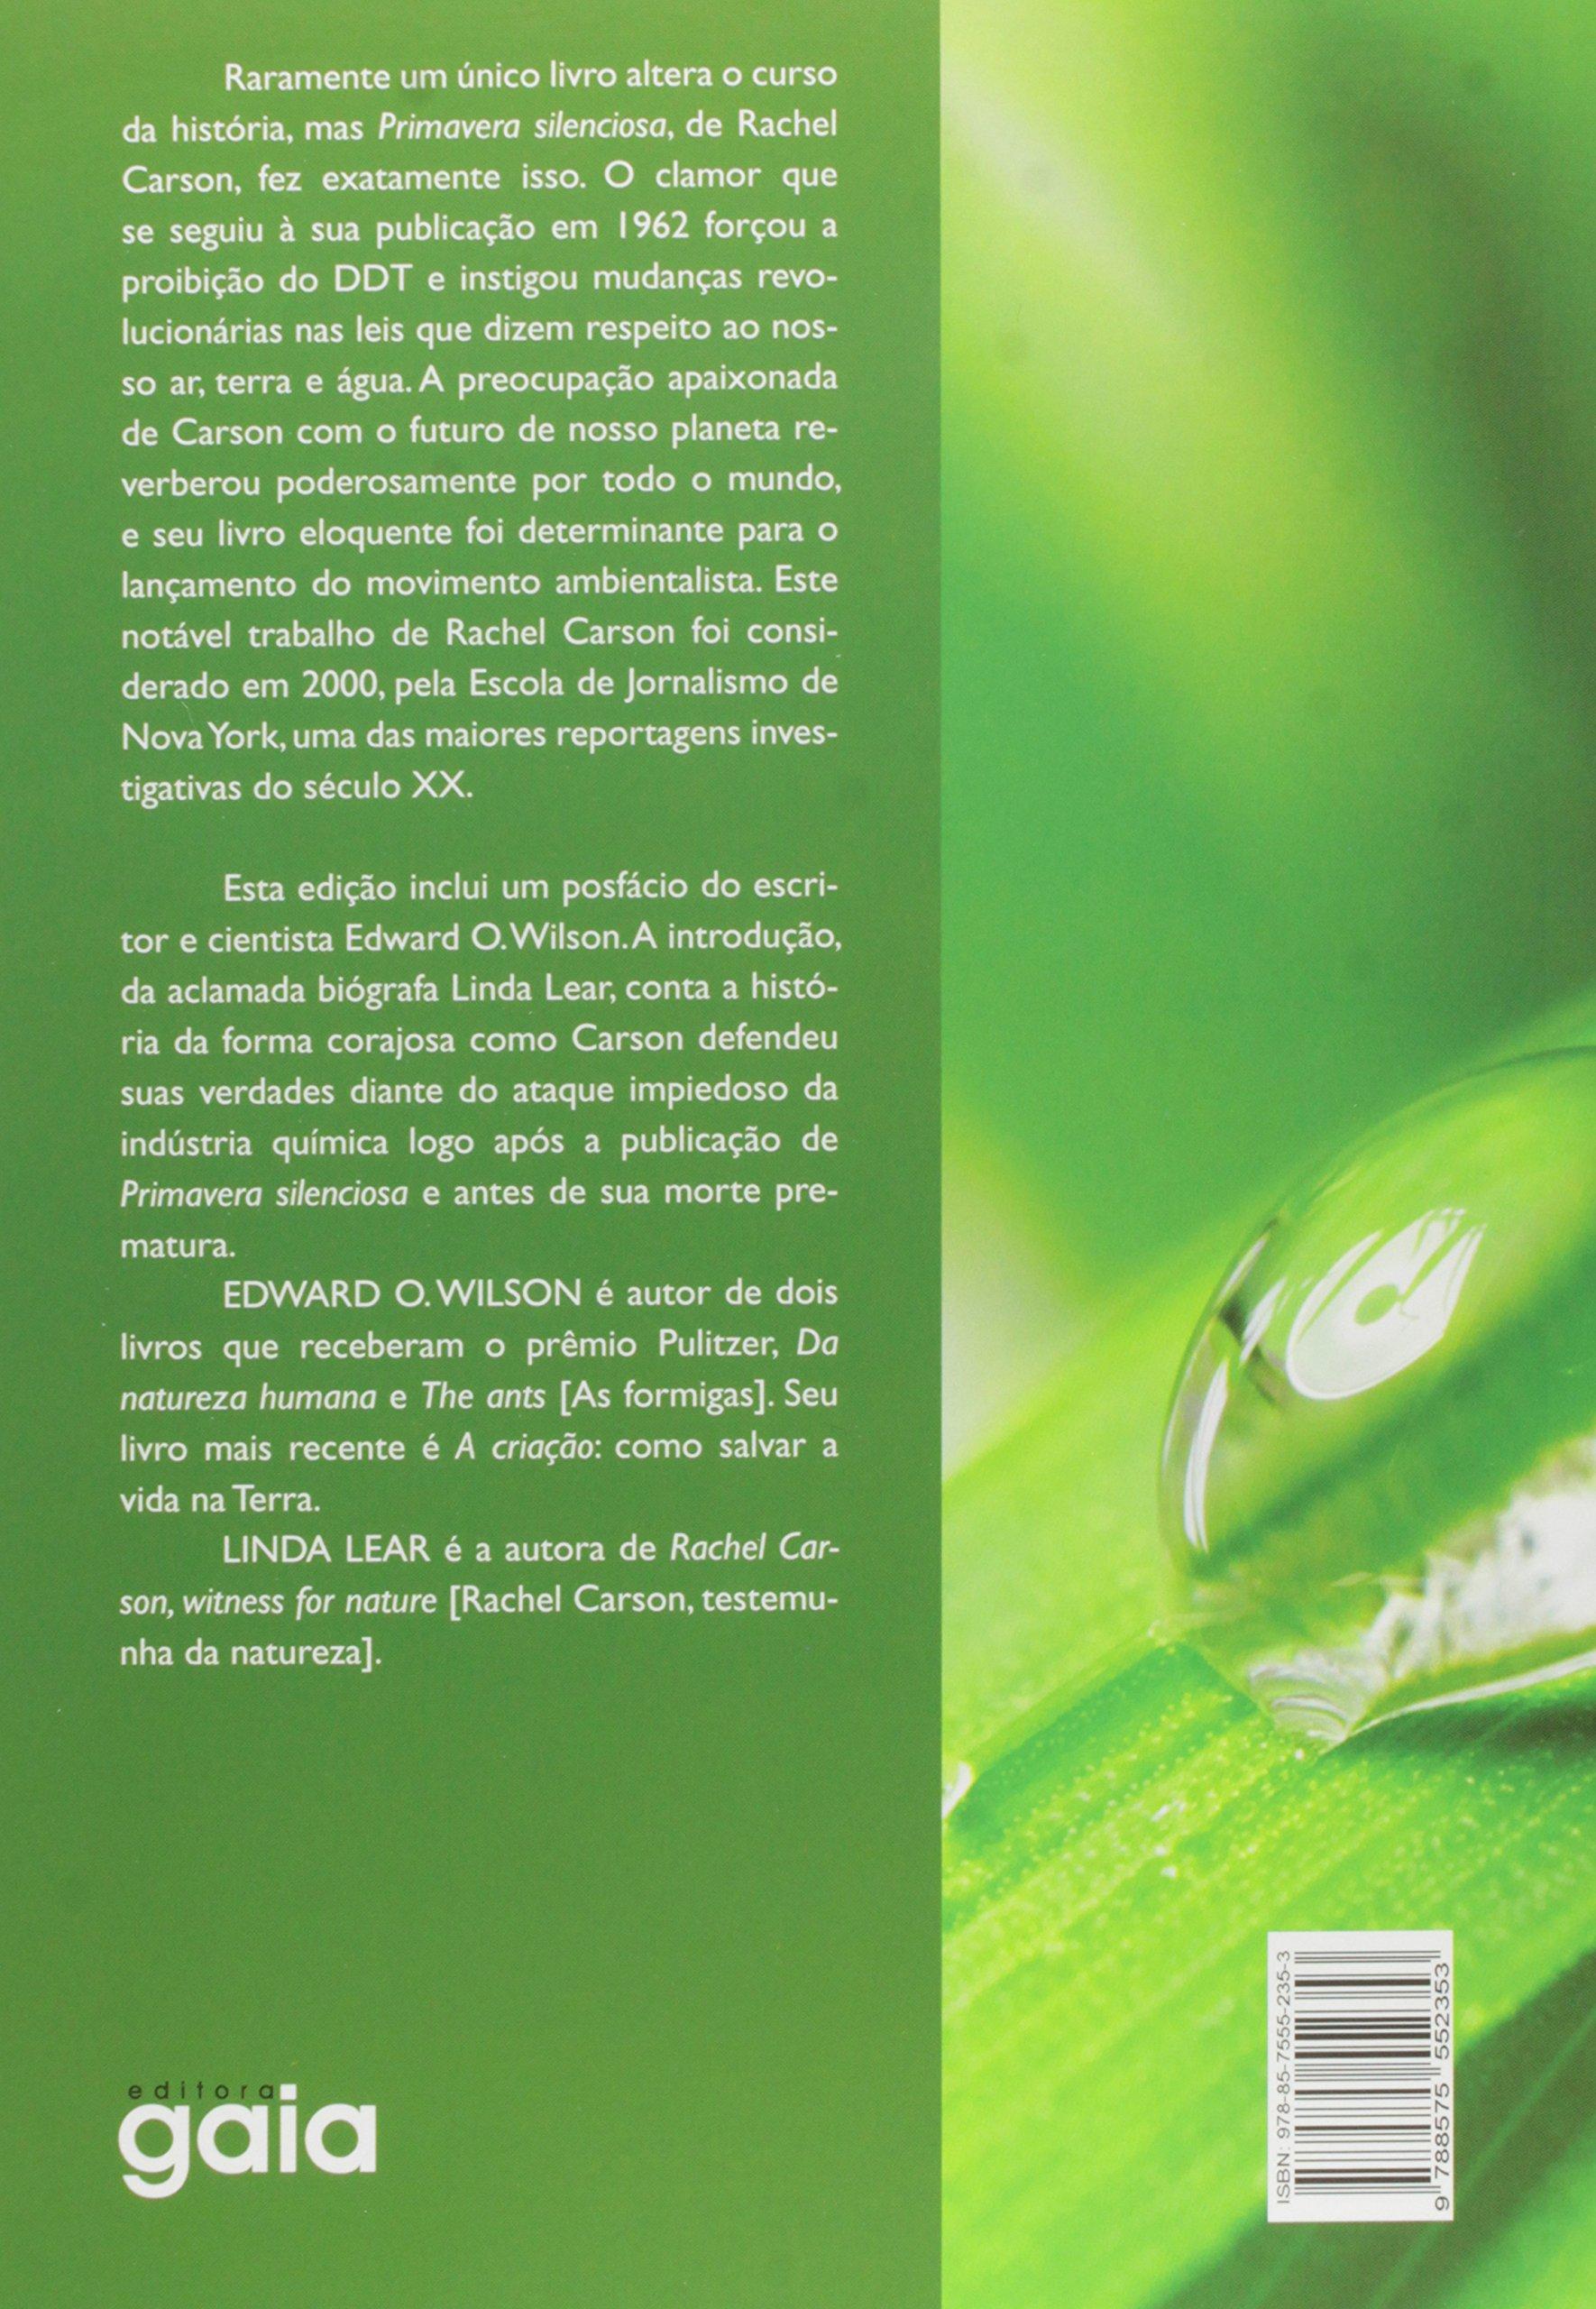 amazon primavera silenciosa português rachel carson social